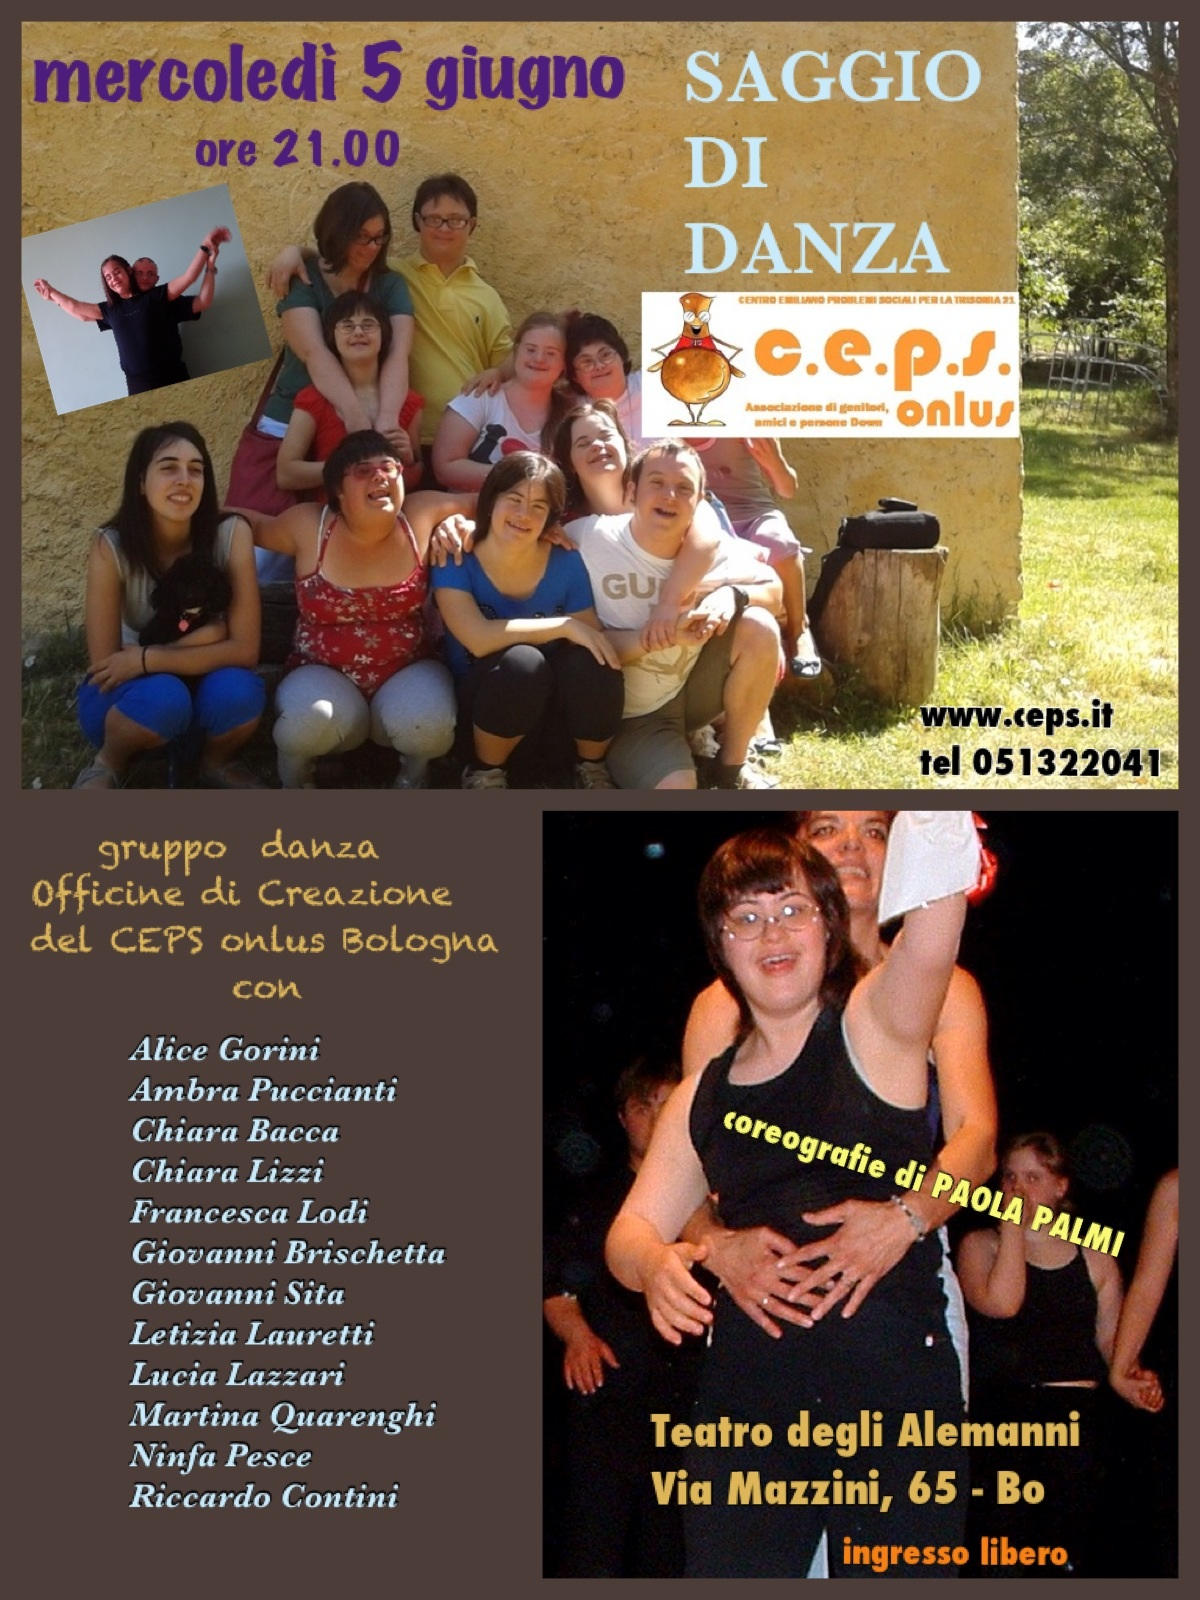 Saggio danza 2013 b